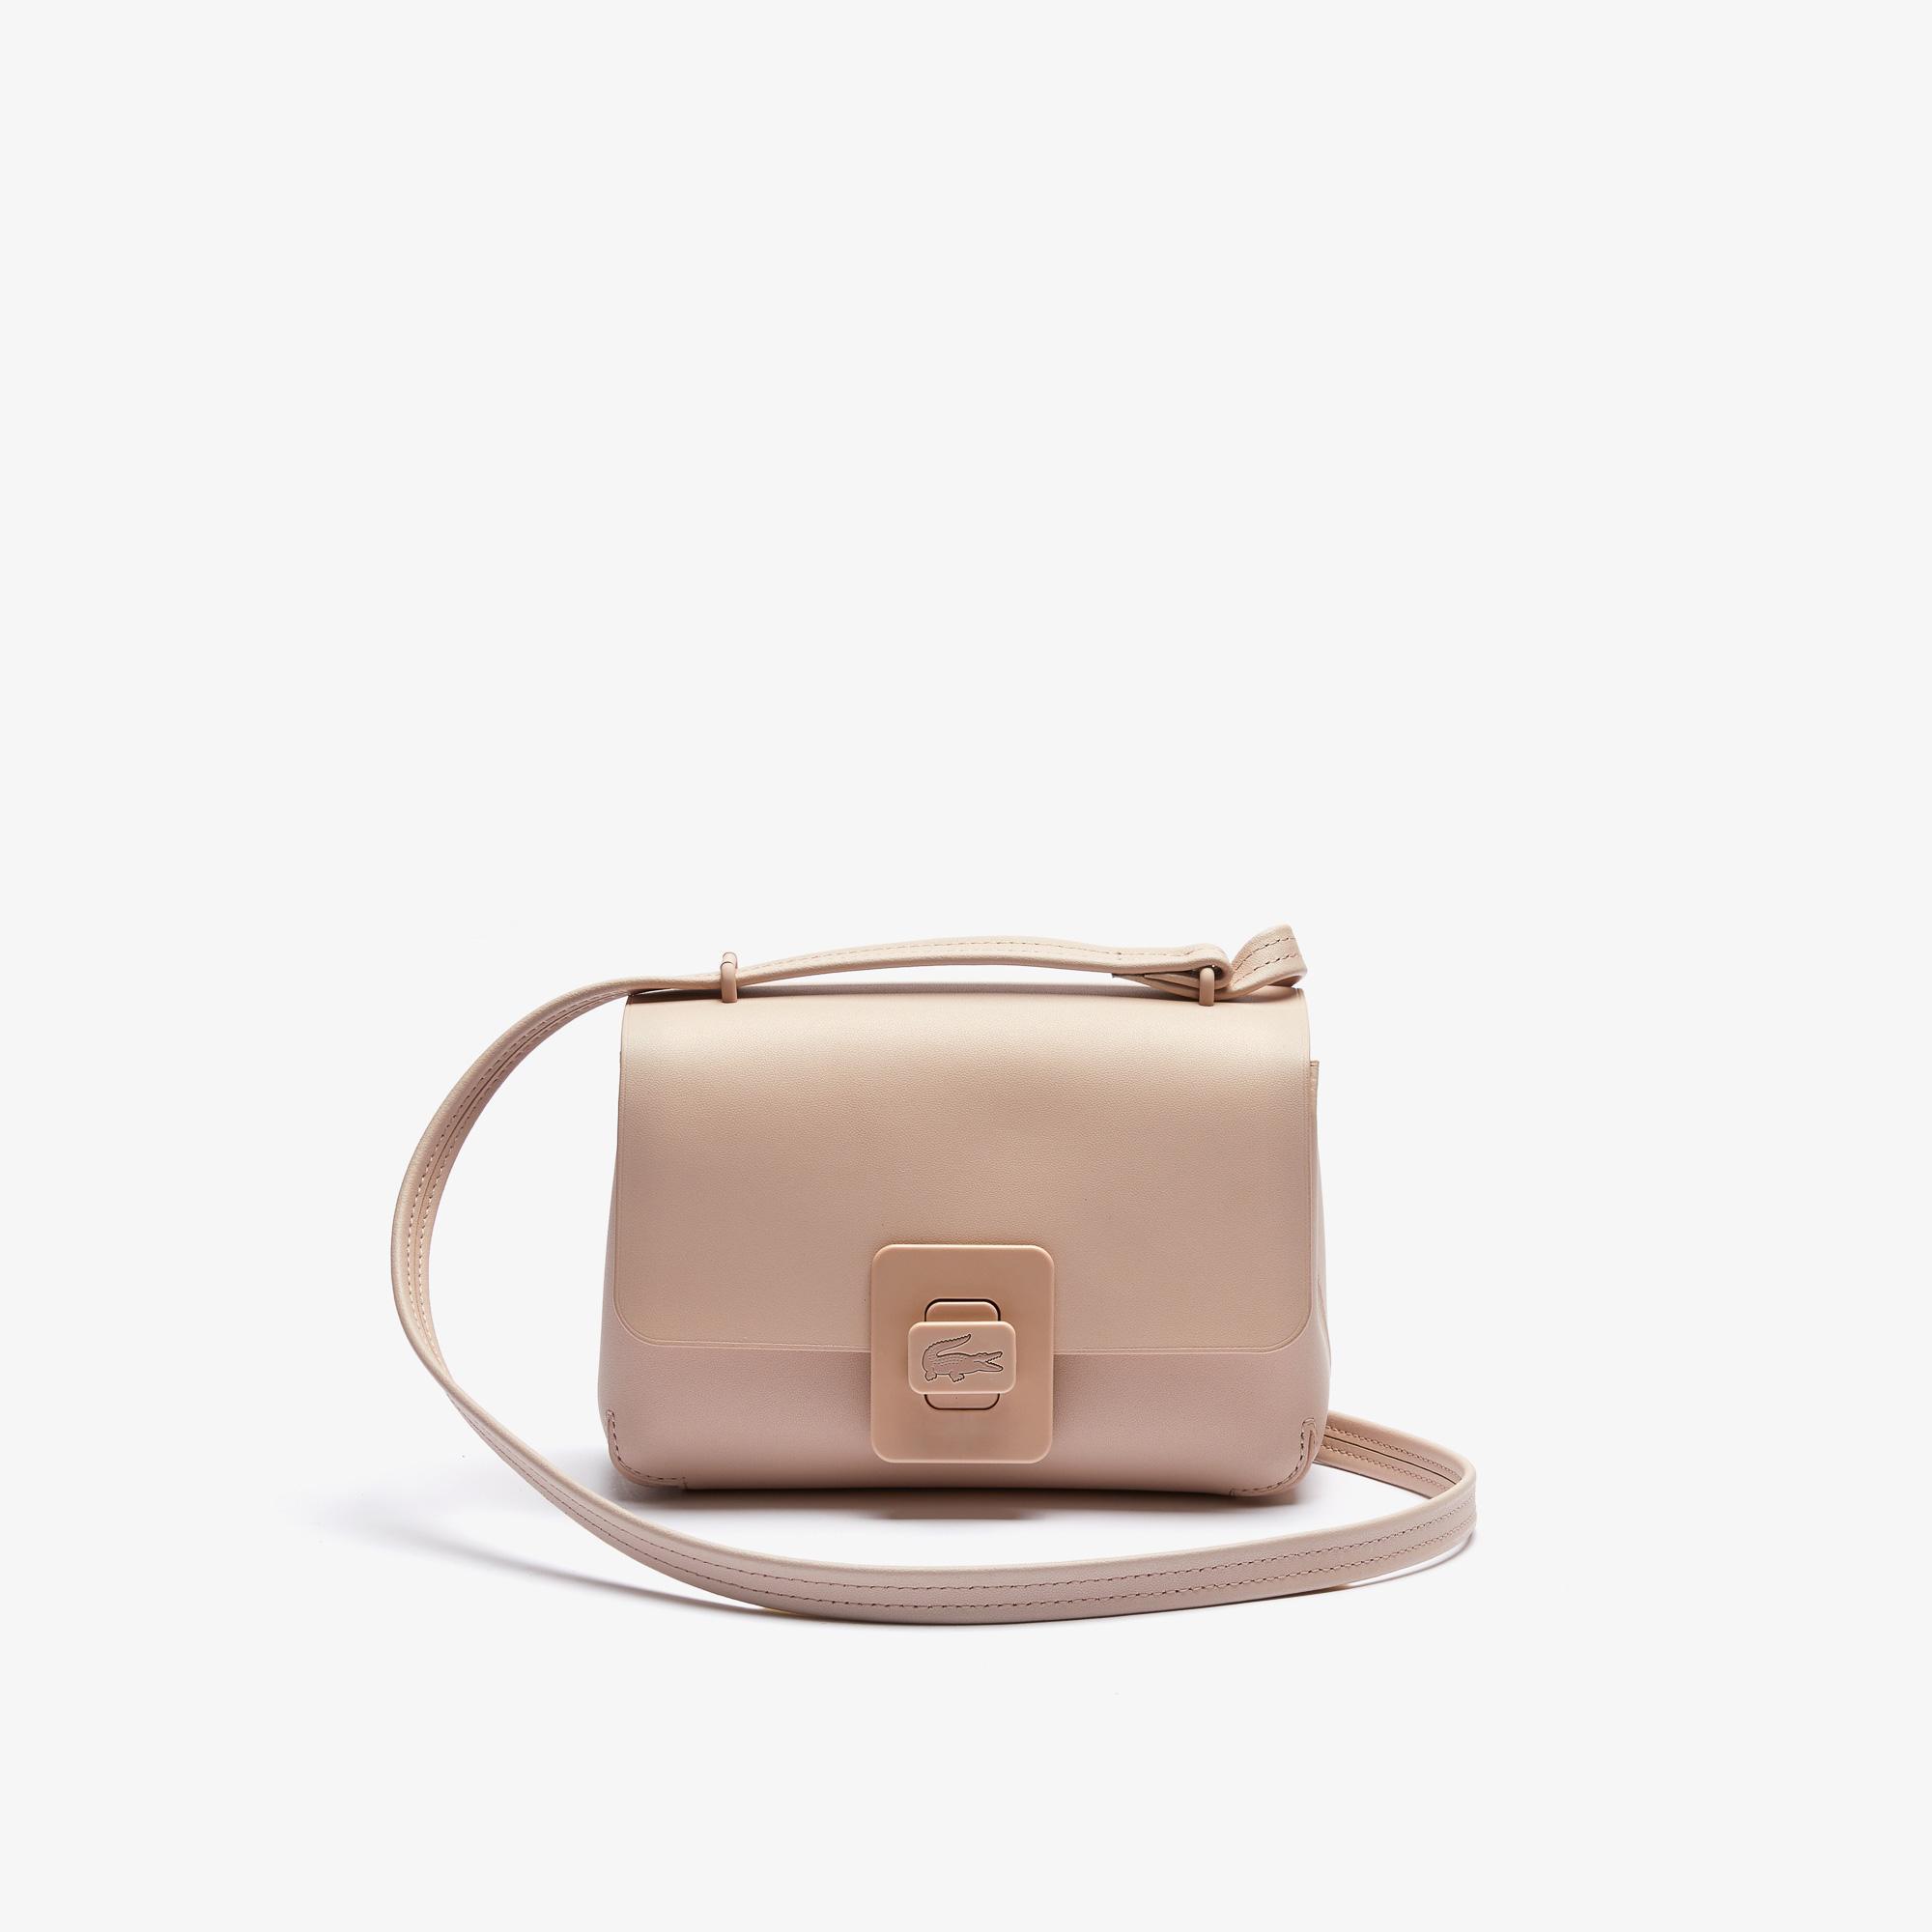 Lacoste сумка жіноча Croco Turn